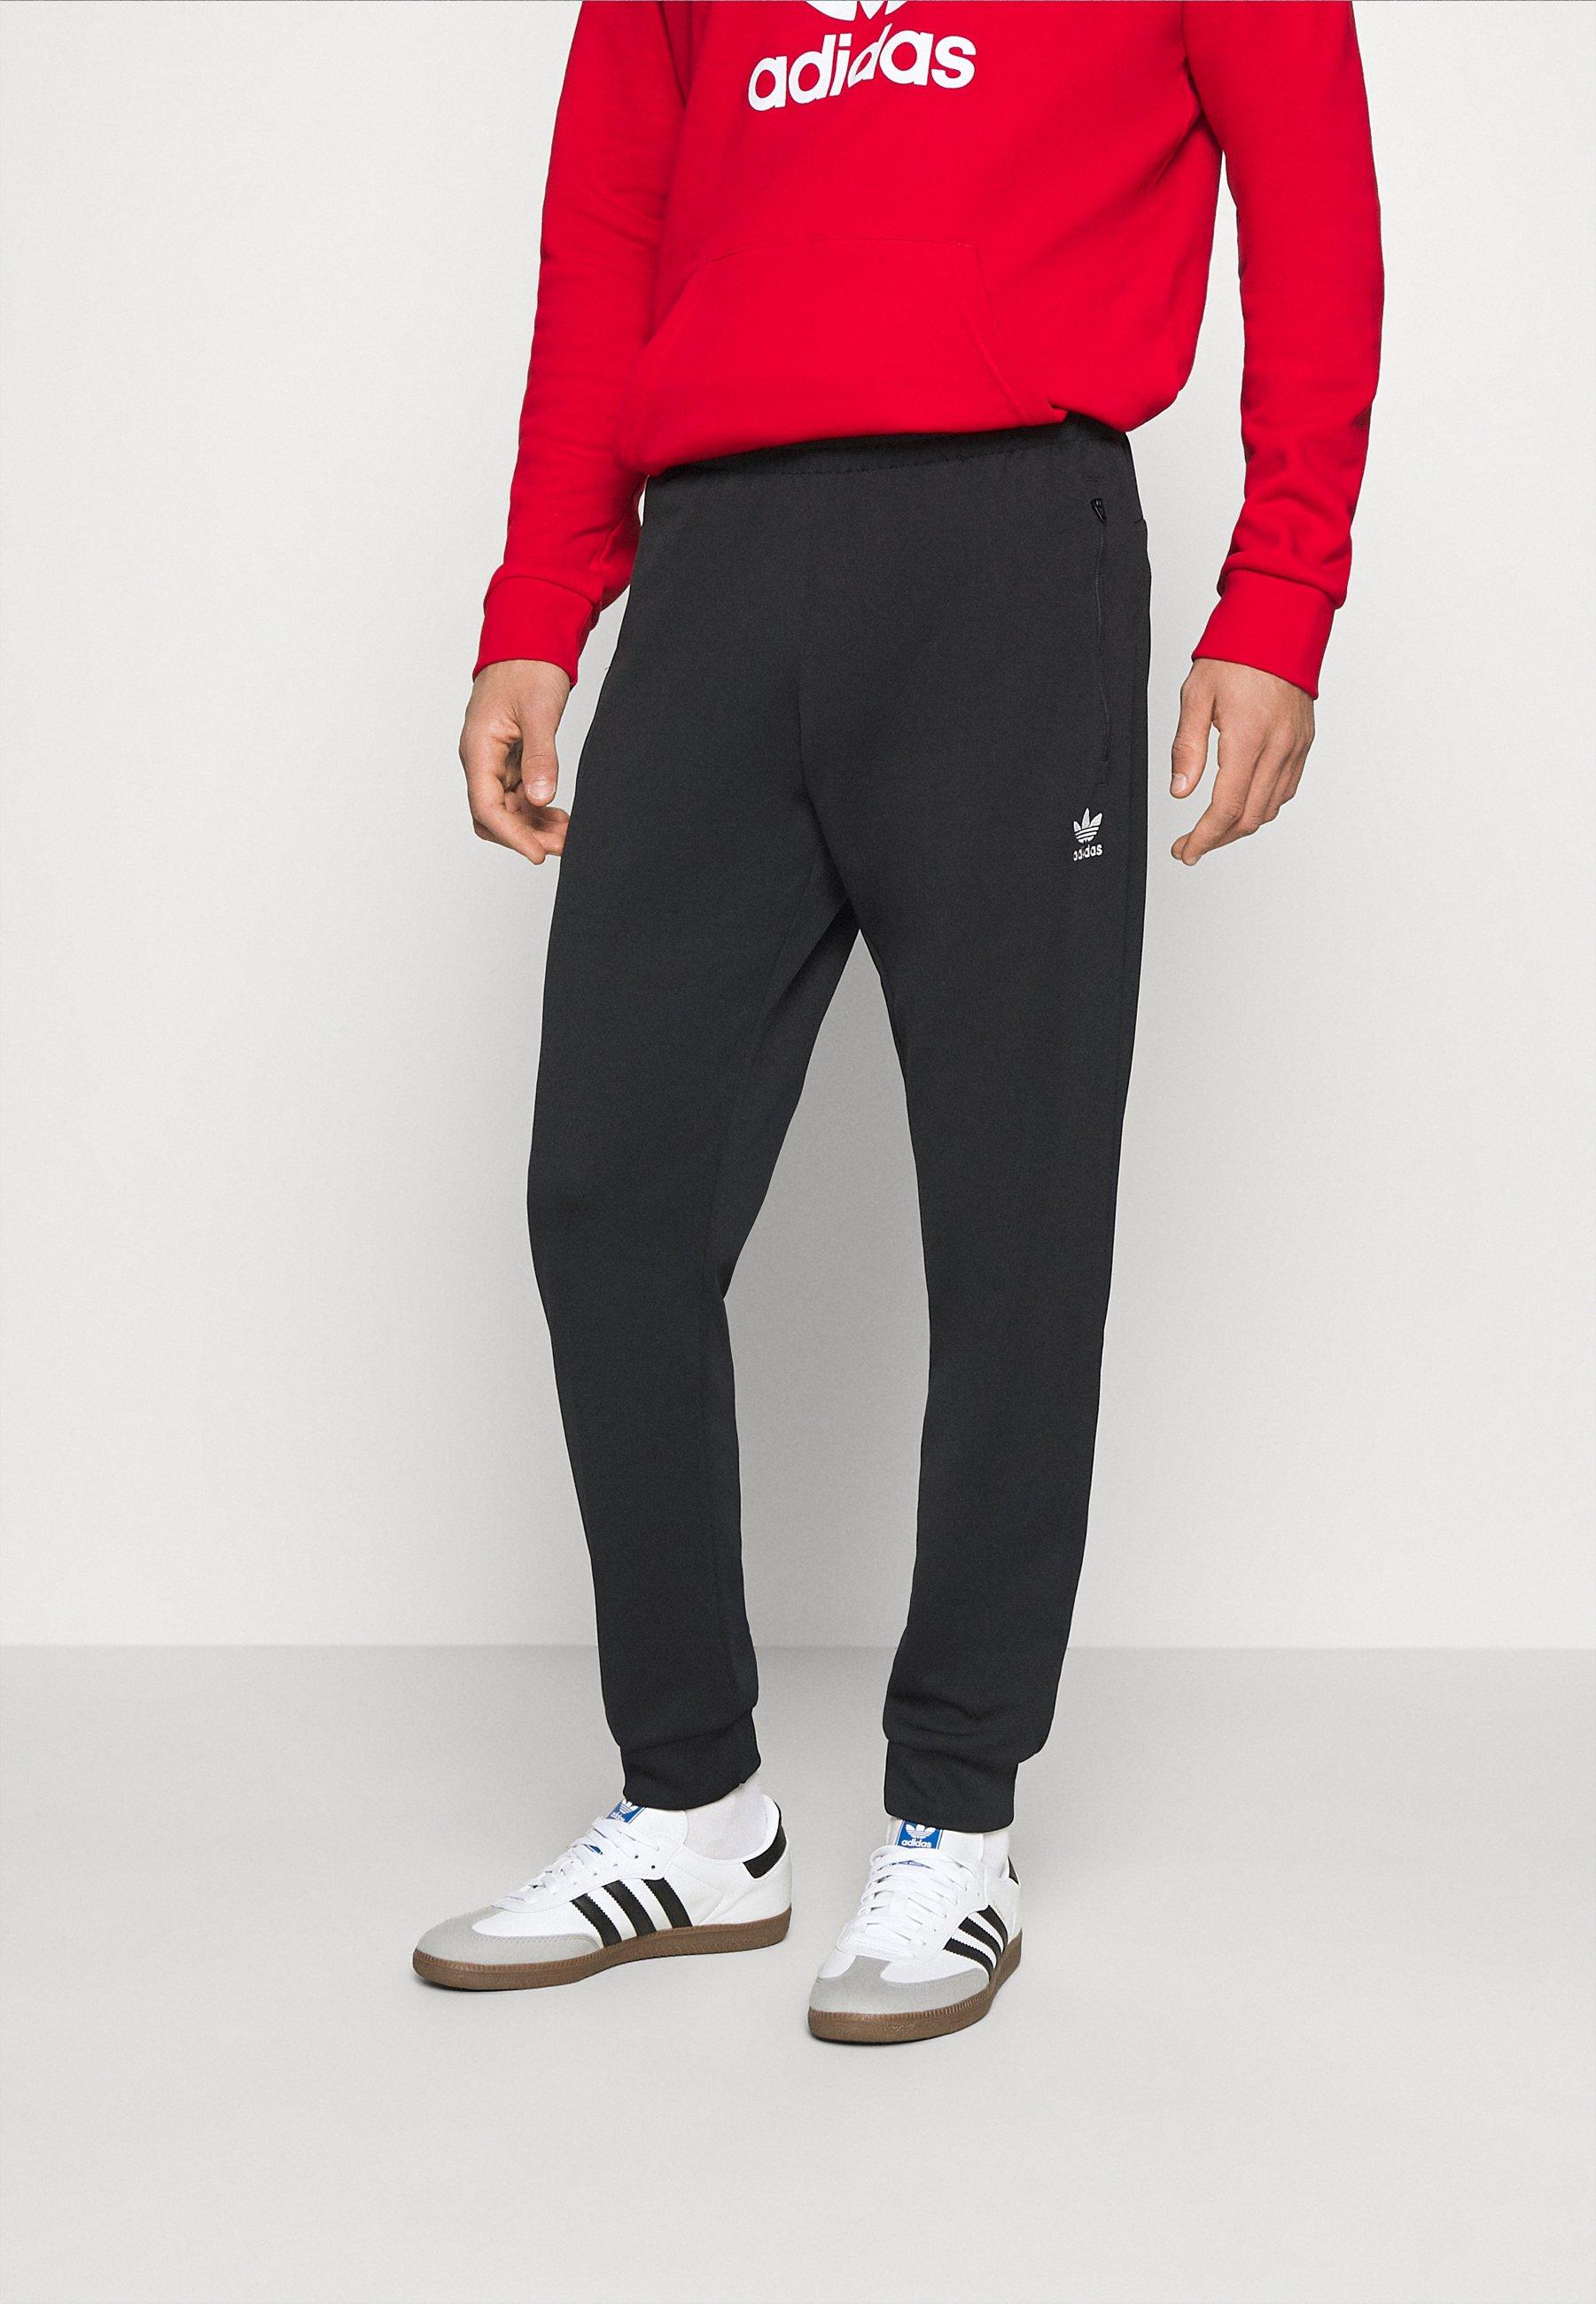 For Sale Men's Clothing adidas Originals ESSENTIAL Tracksuit bottoms black fLBQJsEpb